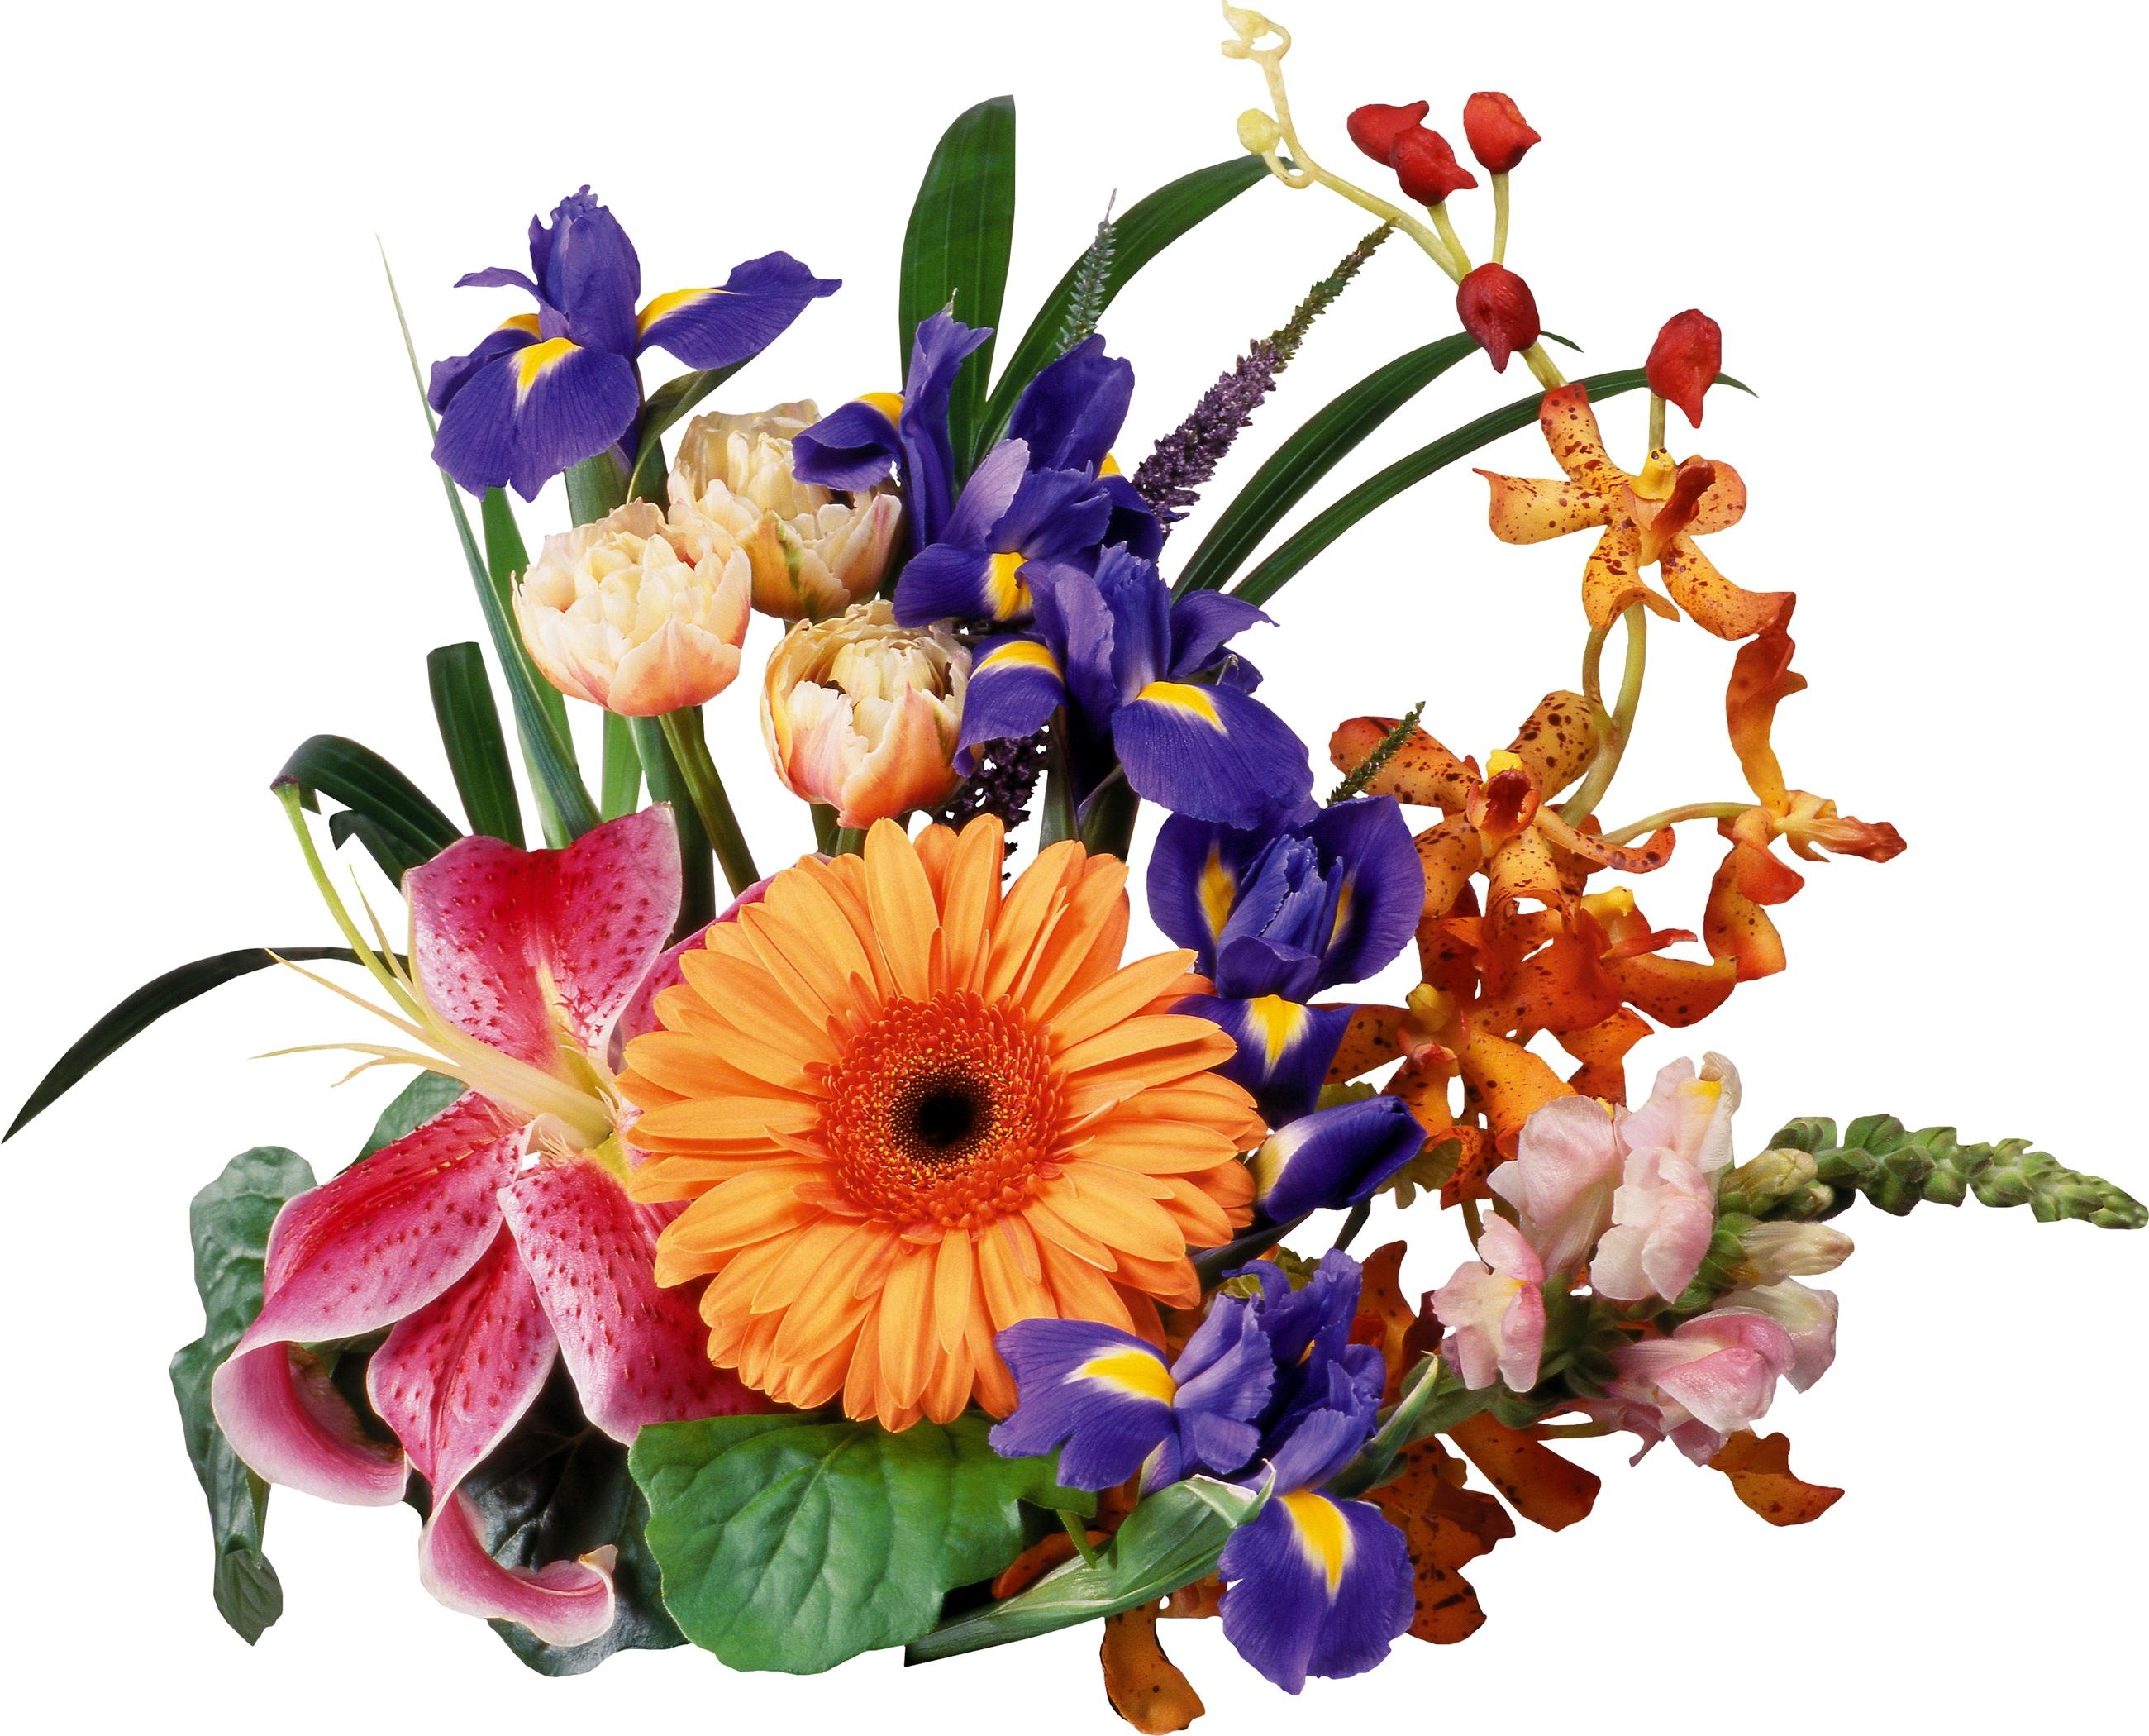 Fondos De Pantalla Hojas Iris Flor Lirio Cancion Planta De